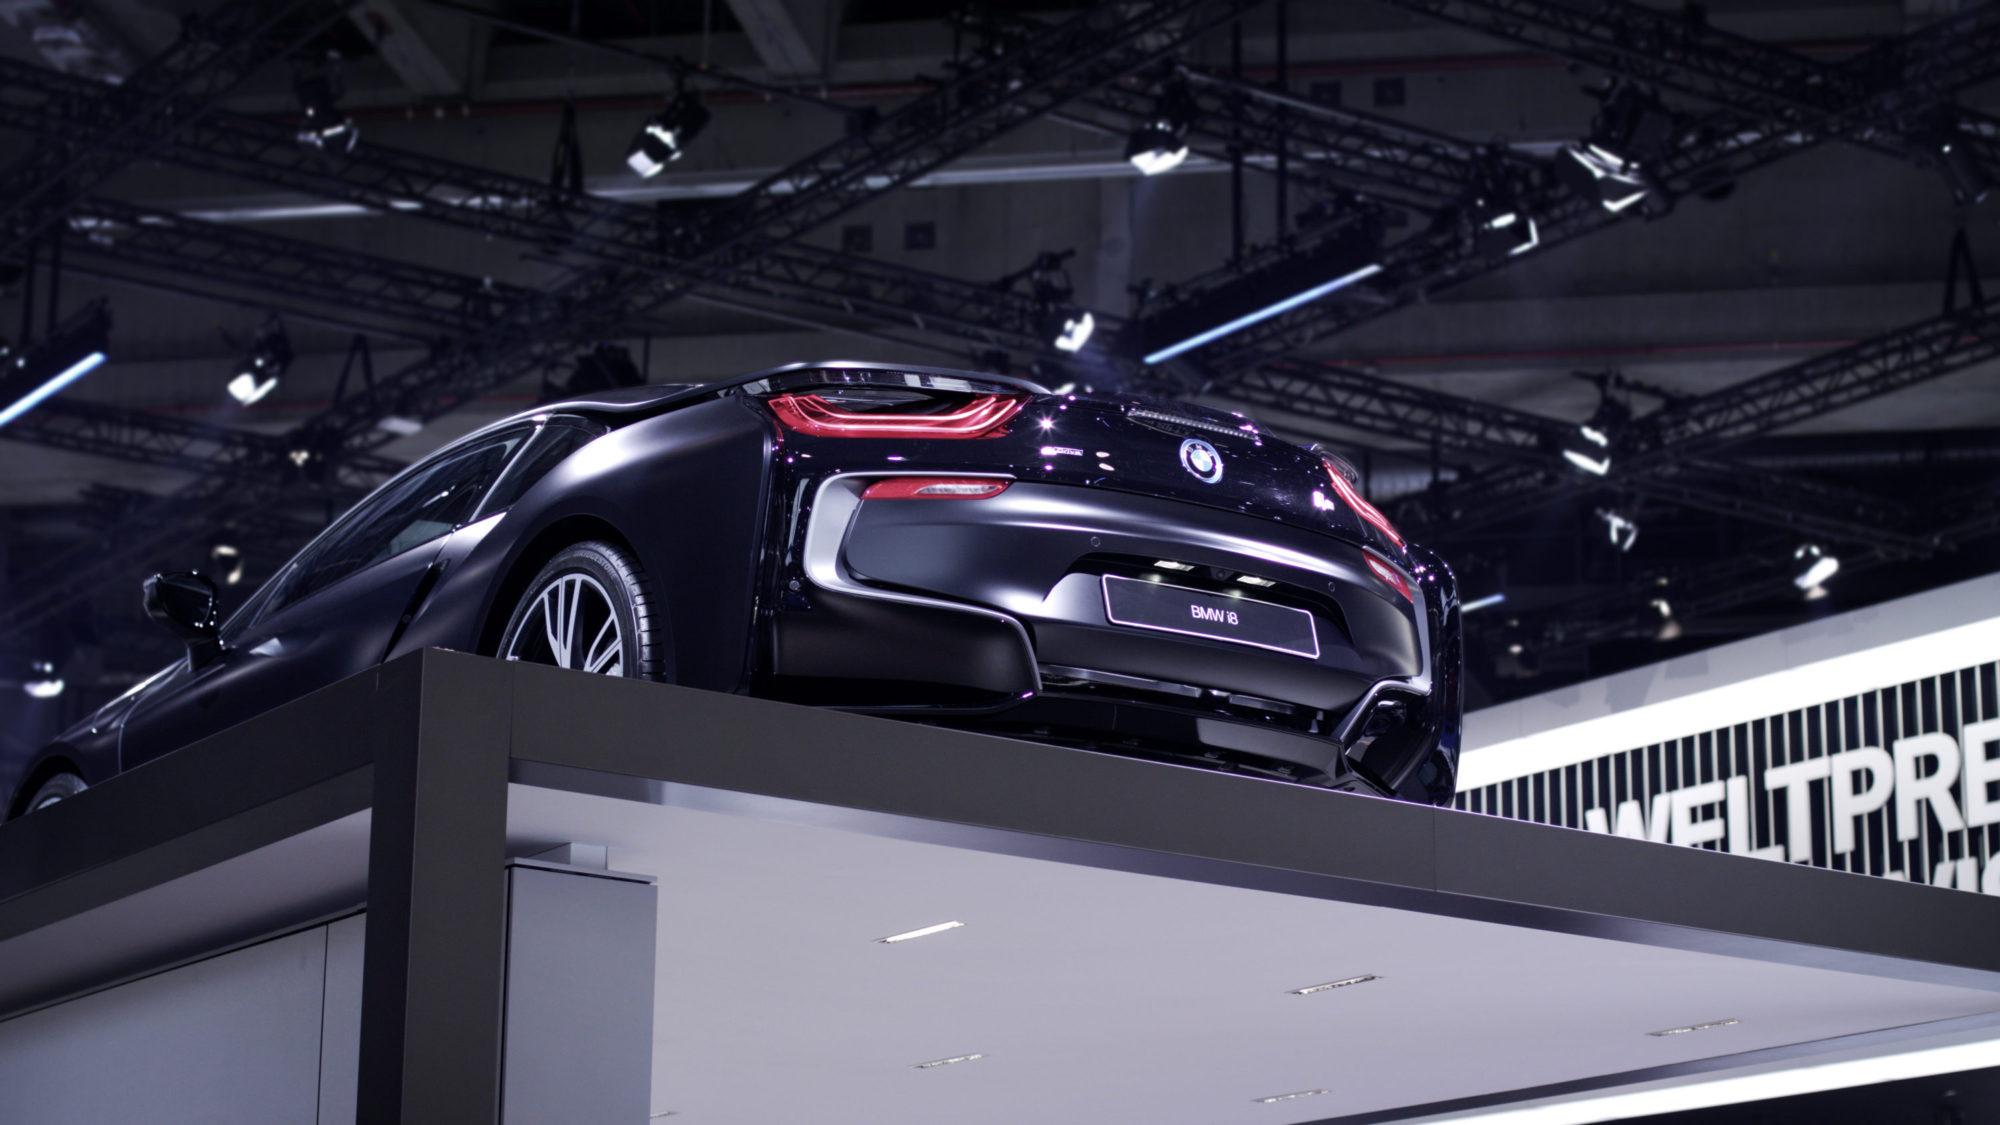 BMW_IAA_Doku_GradedSequence00090765-Wiederhergestellt Kopie